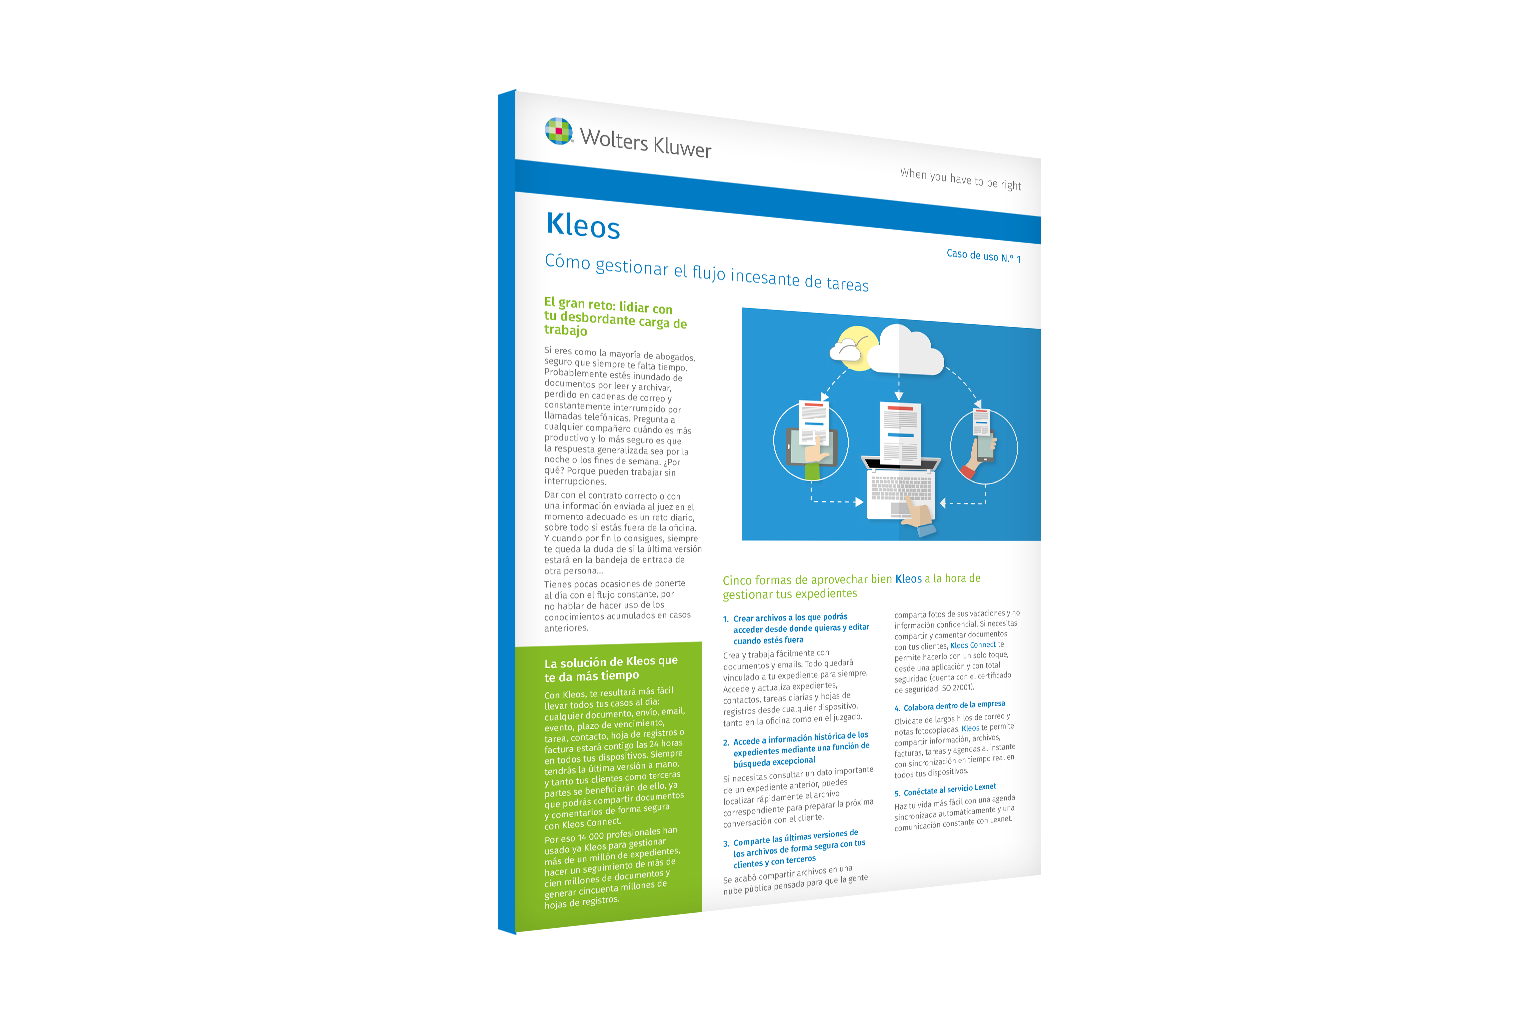 Kleos-Use-Case-1-Managing-Tasks-ES-1536x1024